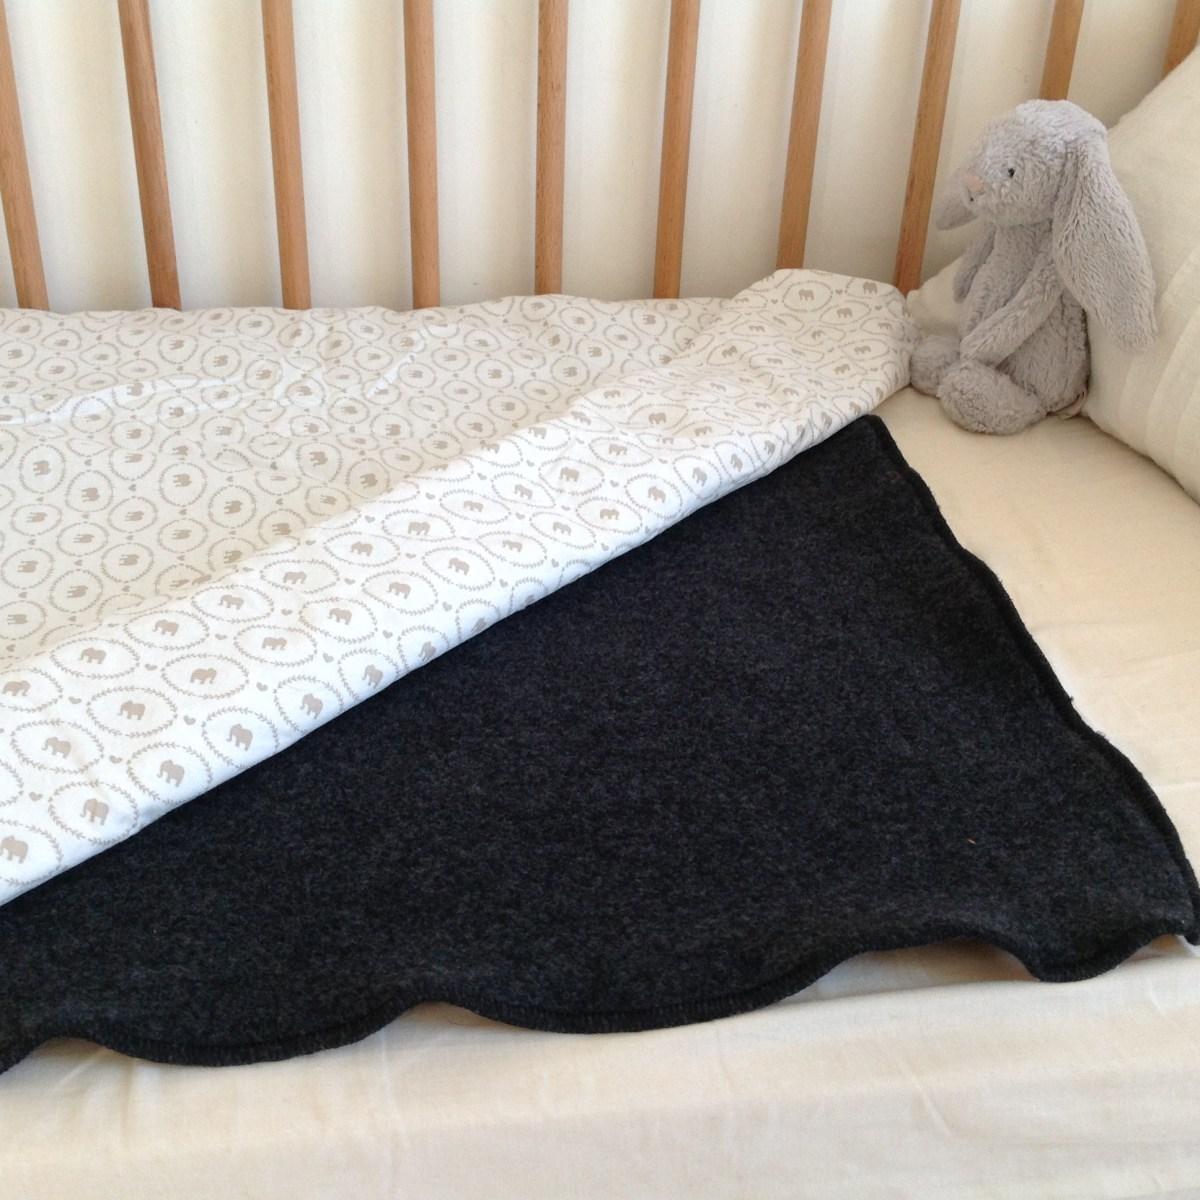 wool mattress protector puddle pad